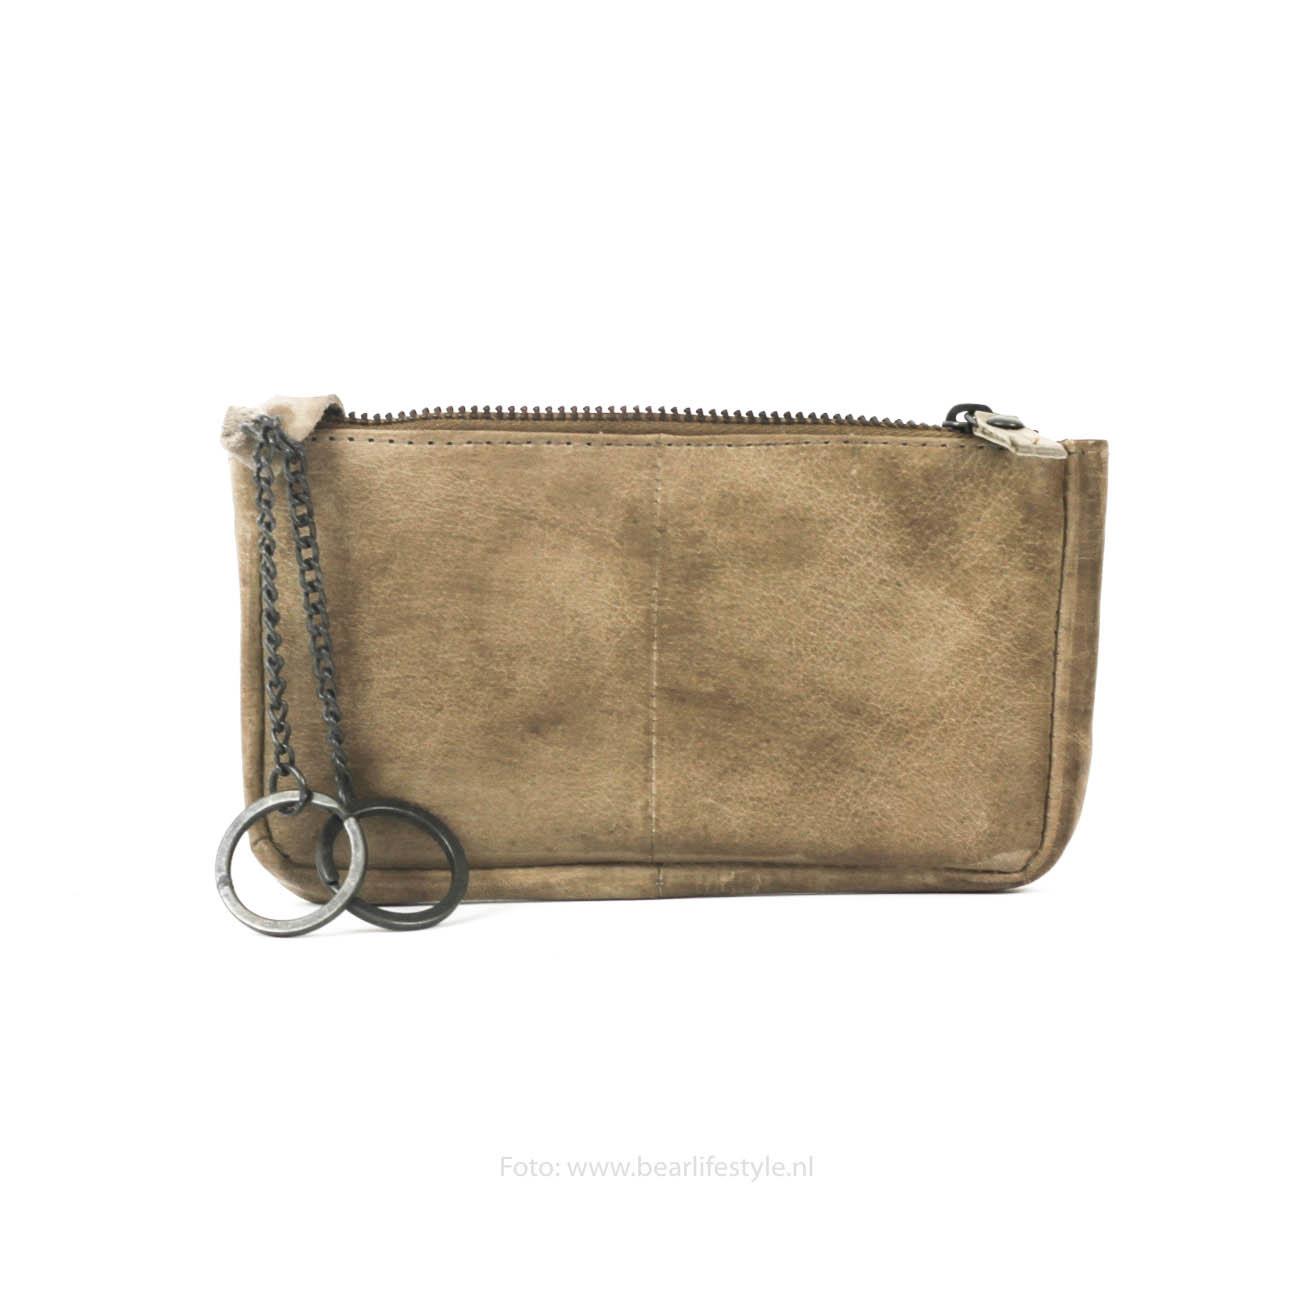 0970dabb60e26 Bear Design Schlüssel-   Lösegeldbörse CP7090 - Taupe - BEAR Lifestyle